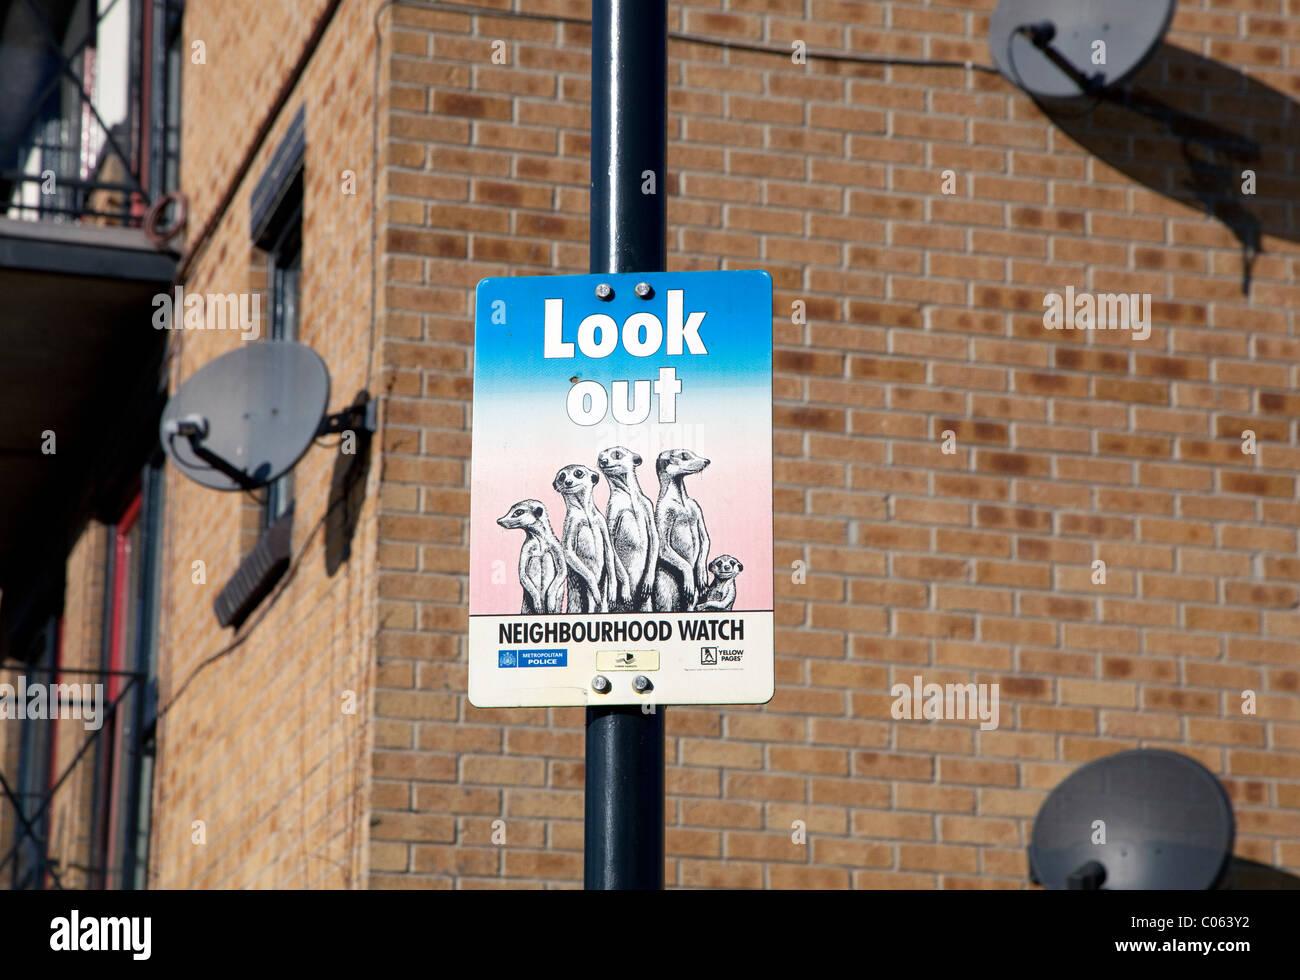 Neighbourhood Watch sign & Sky dishes, Mudchute, Isle of Dogs, London - Stock Image